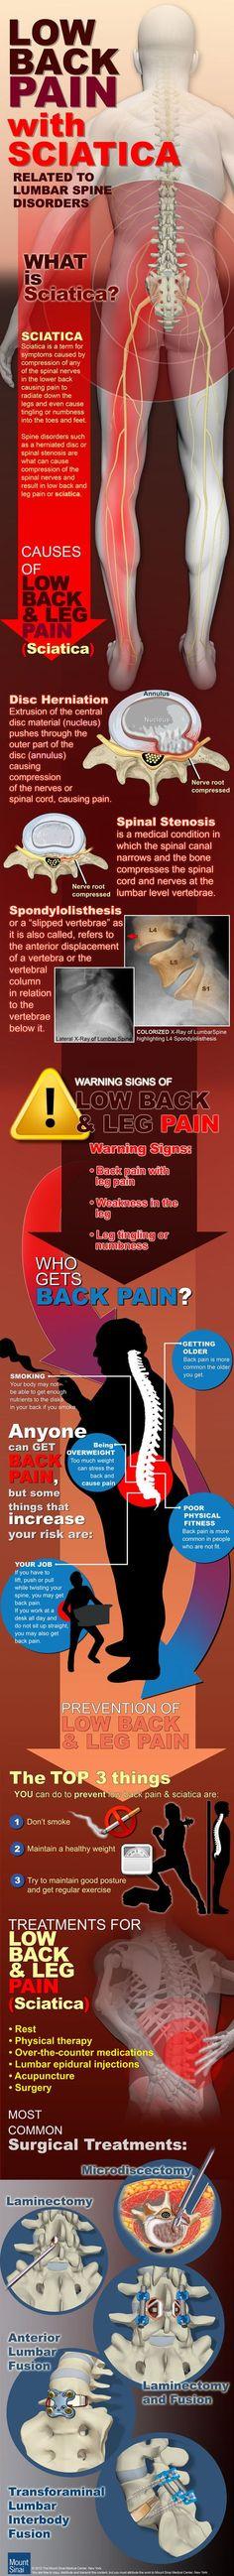 Low back pain with sciatica | www.massagestore.com